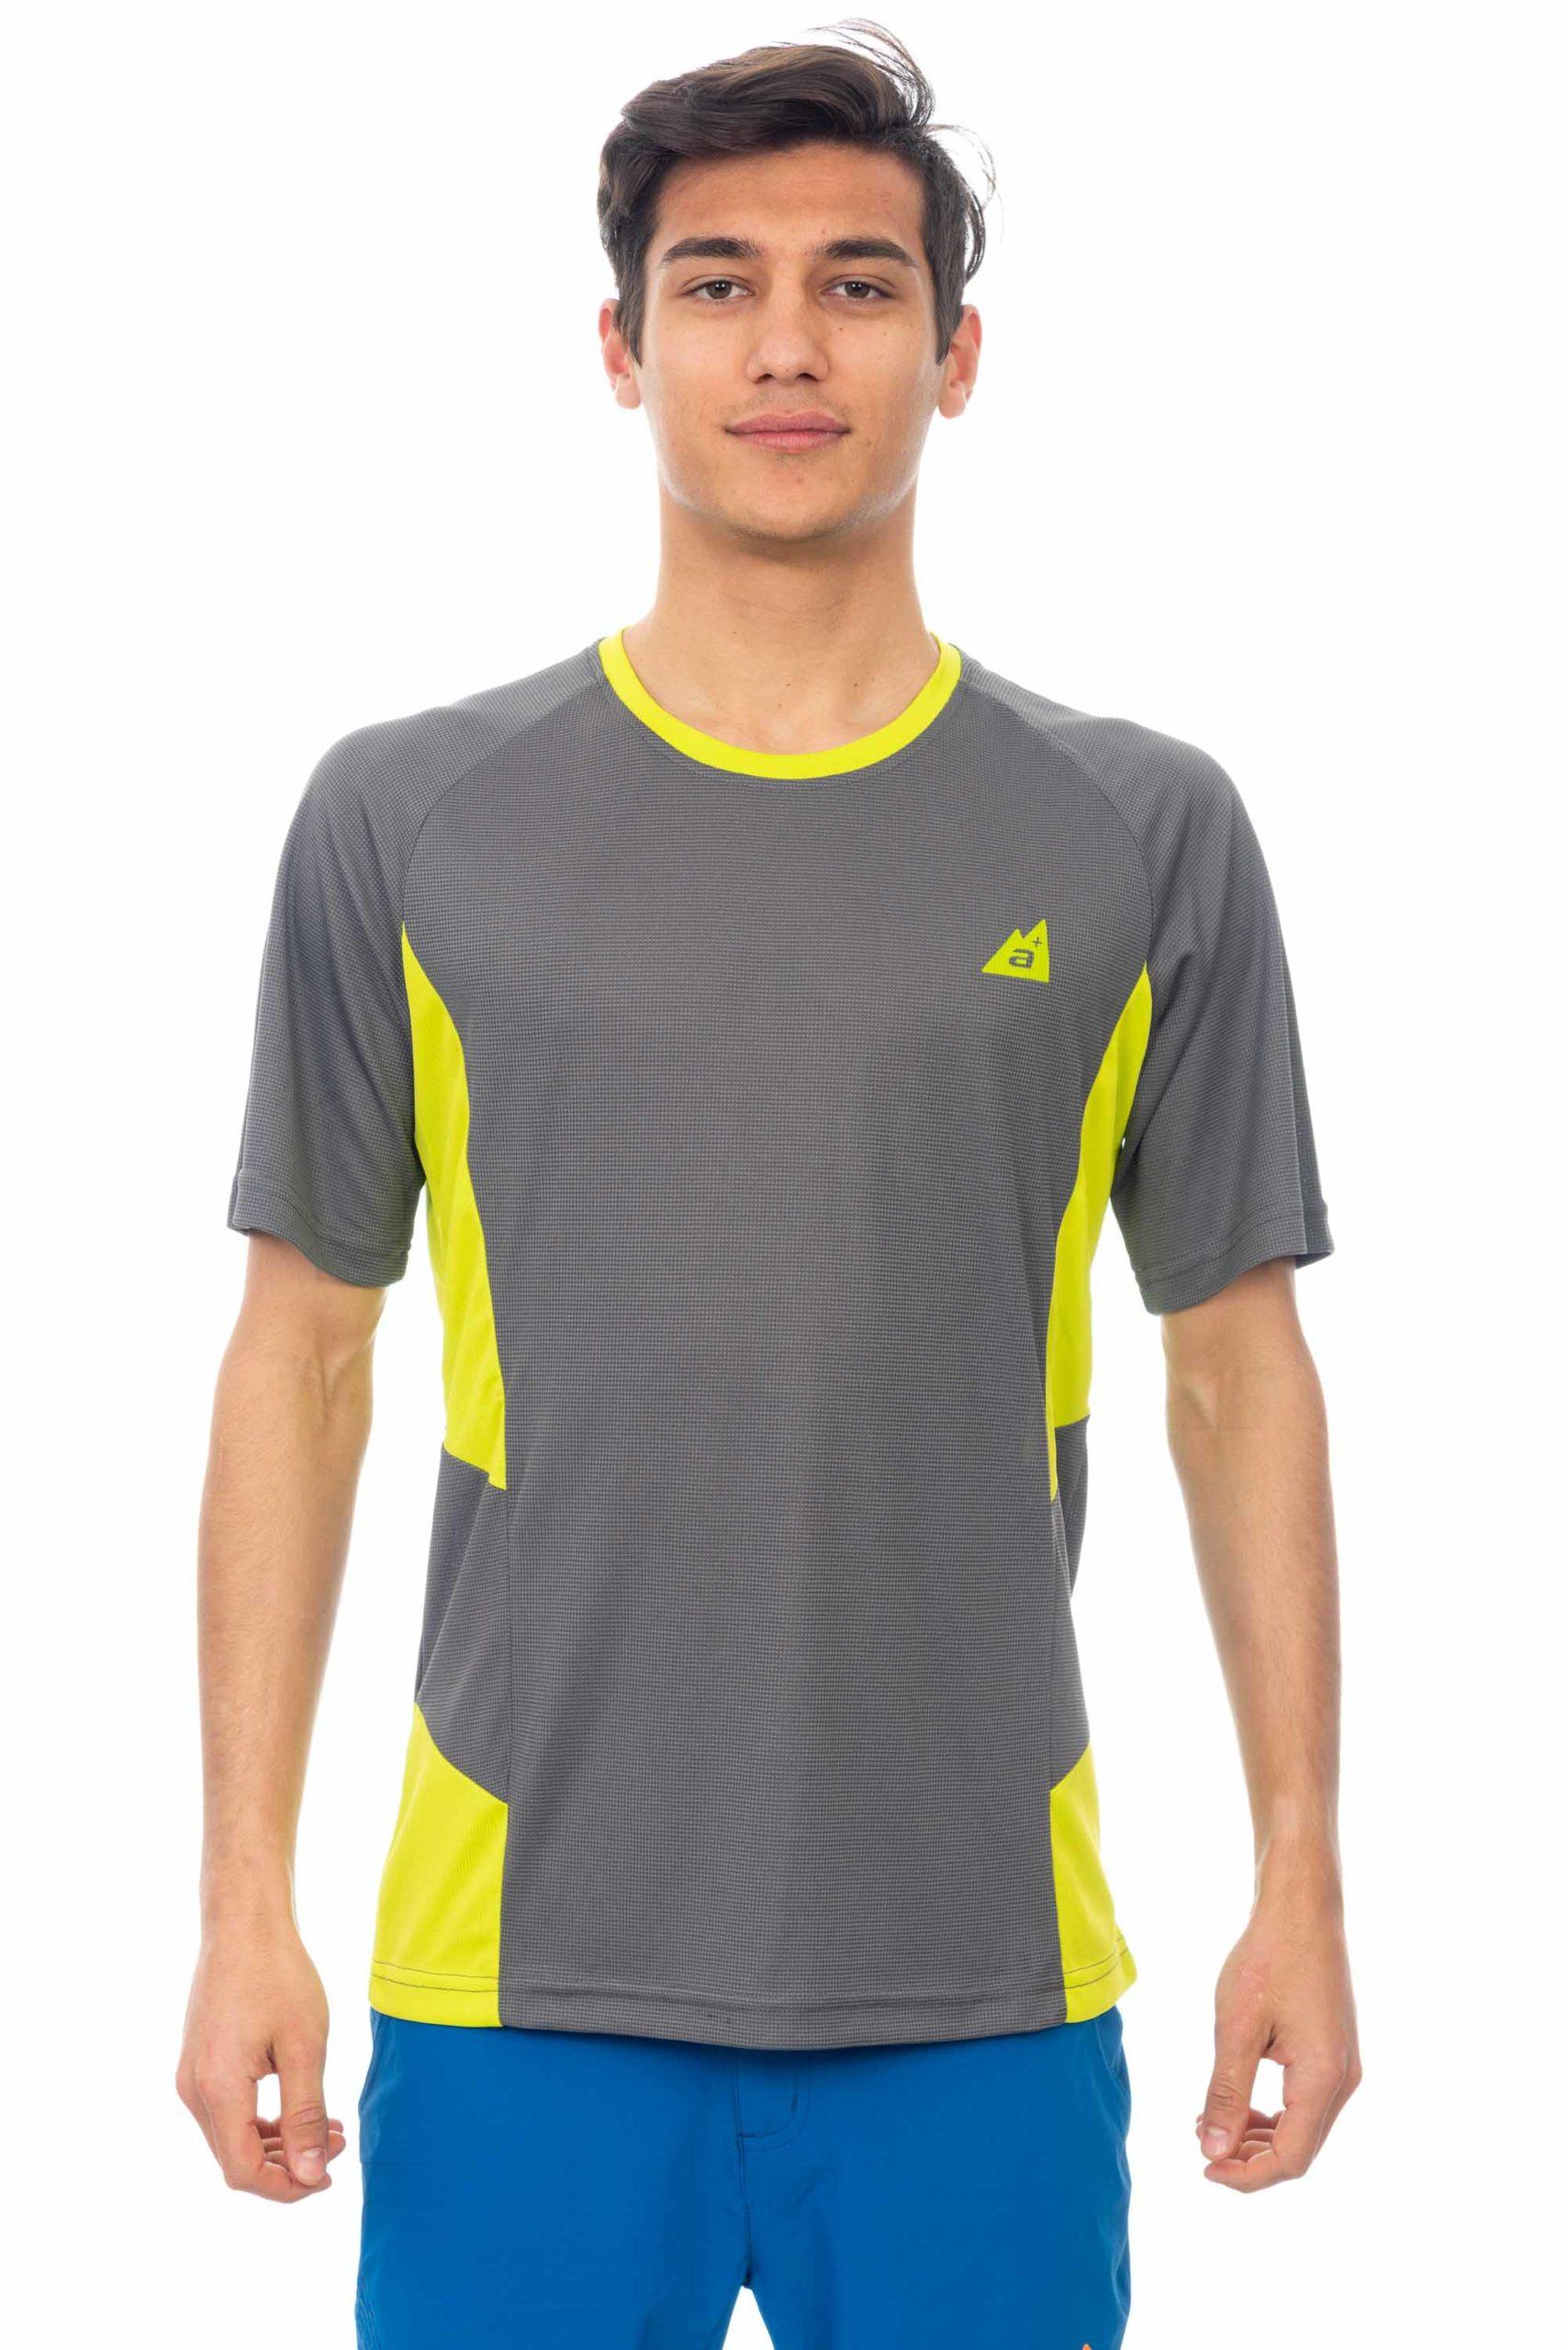 T-shirt uomo traspirante outdoor